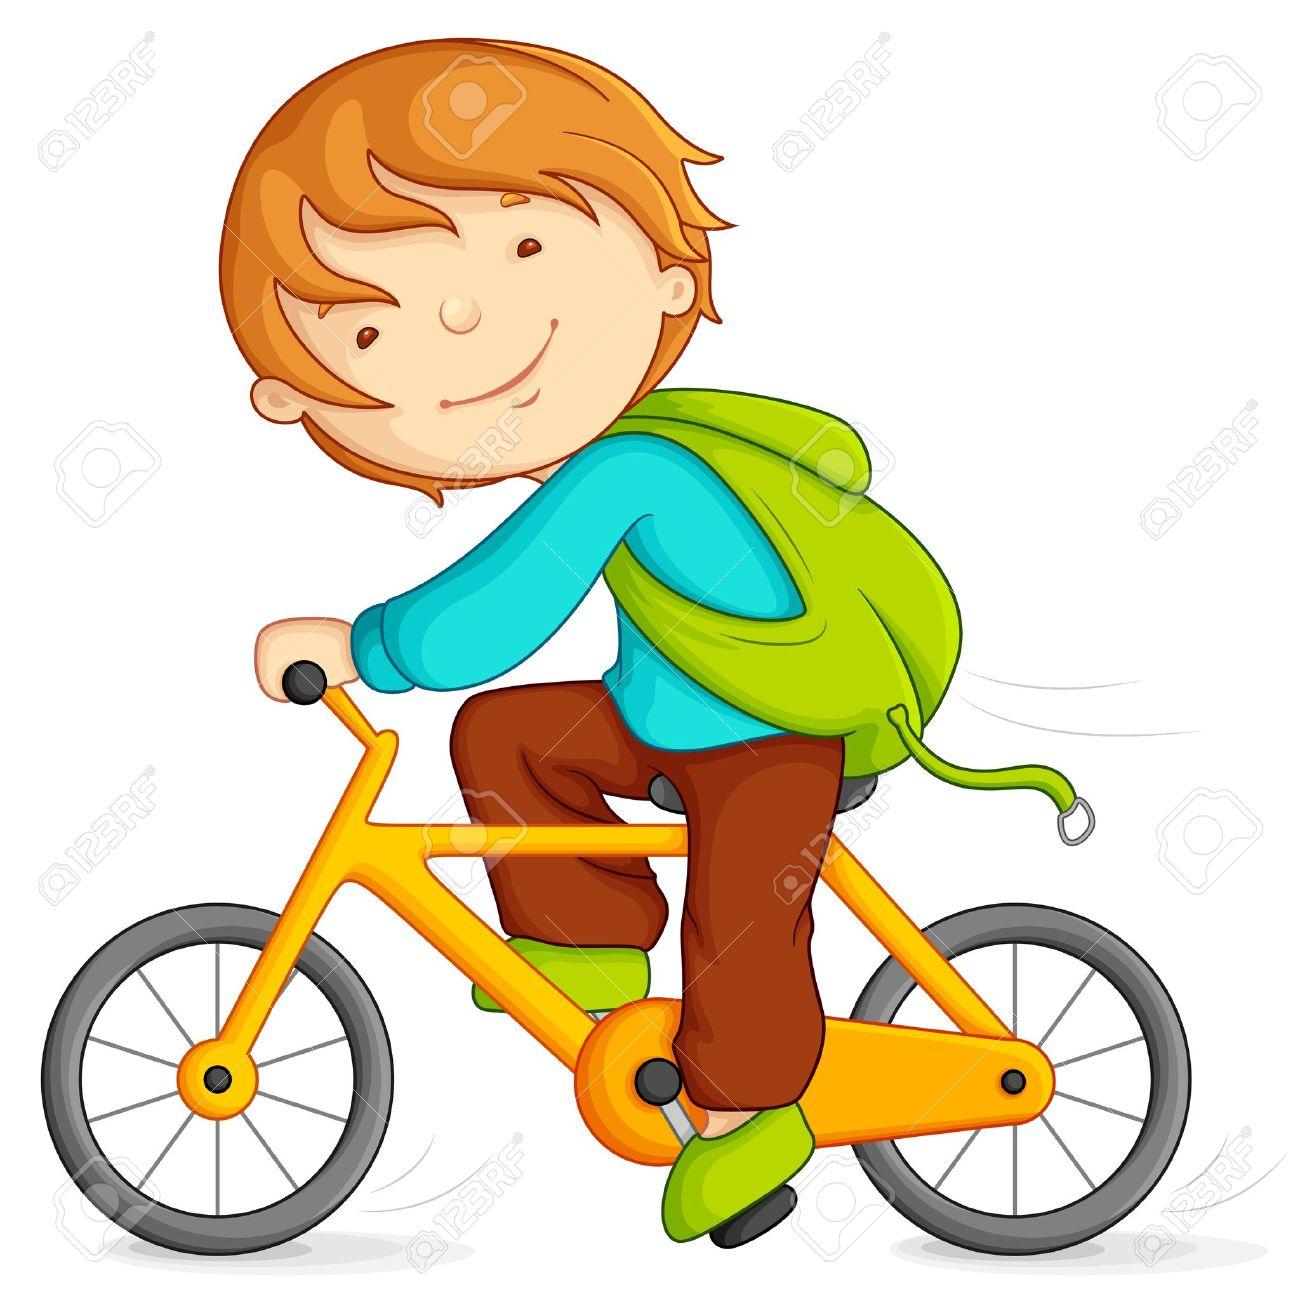 Ребенок на велосипеде рисунок